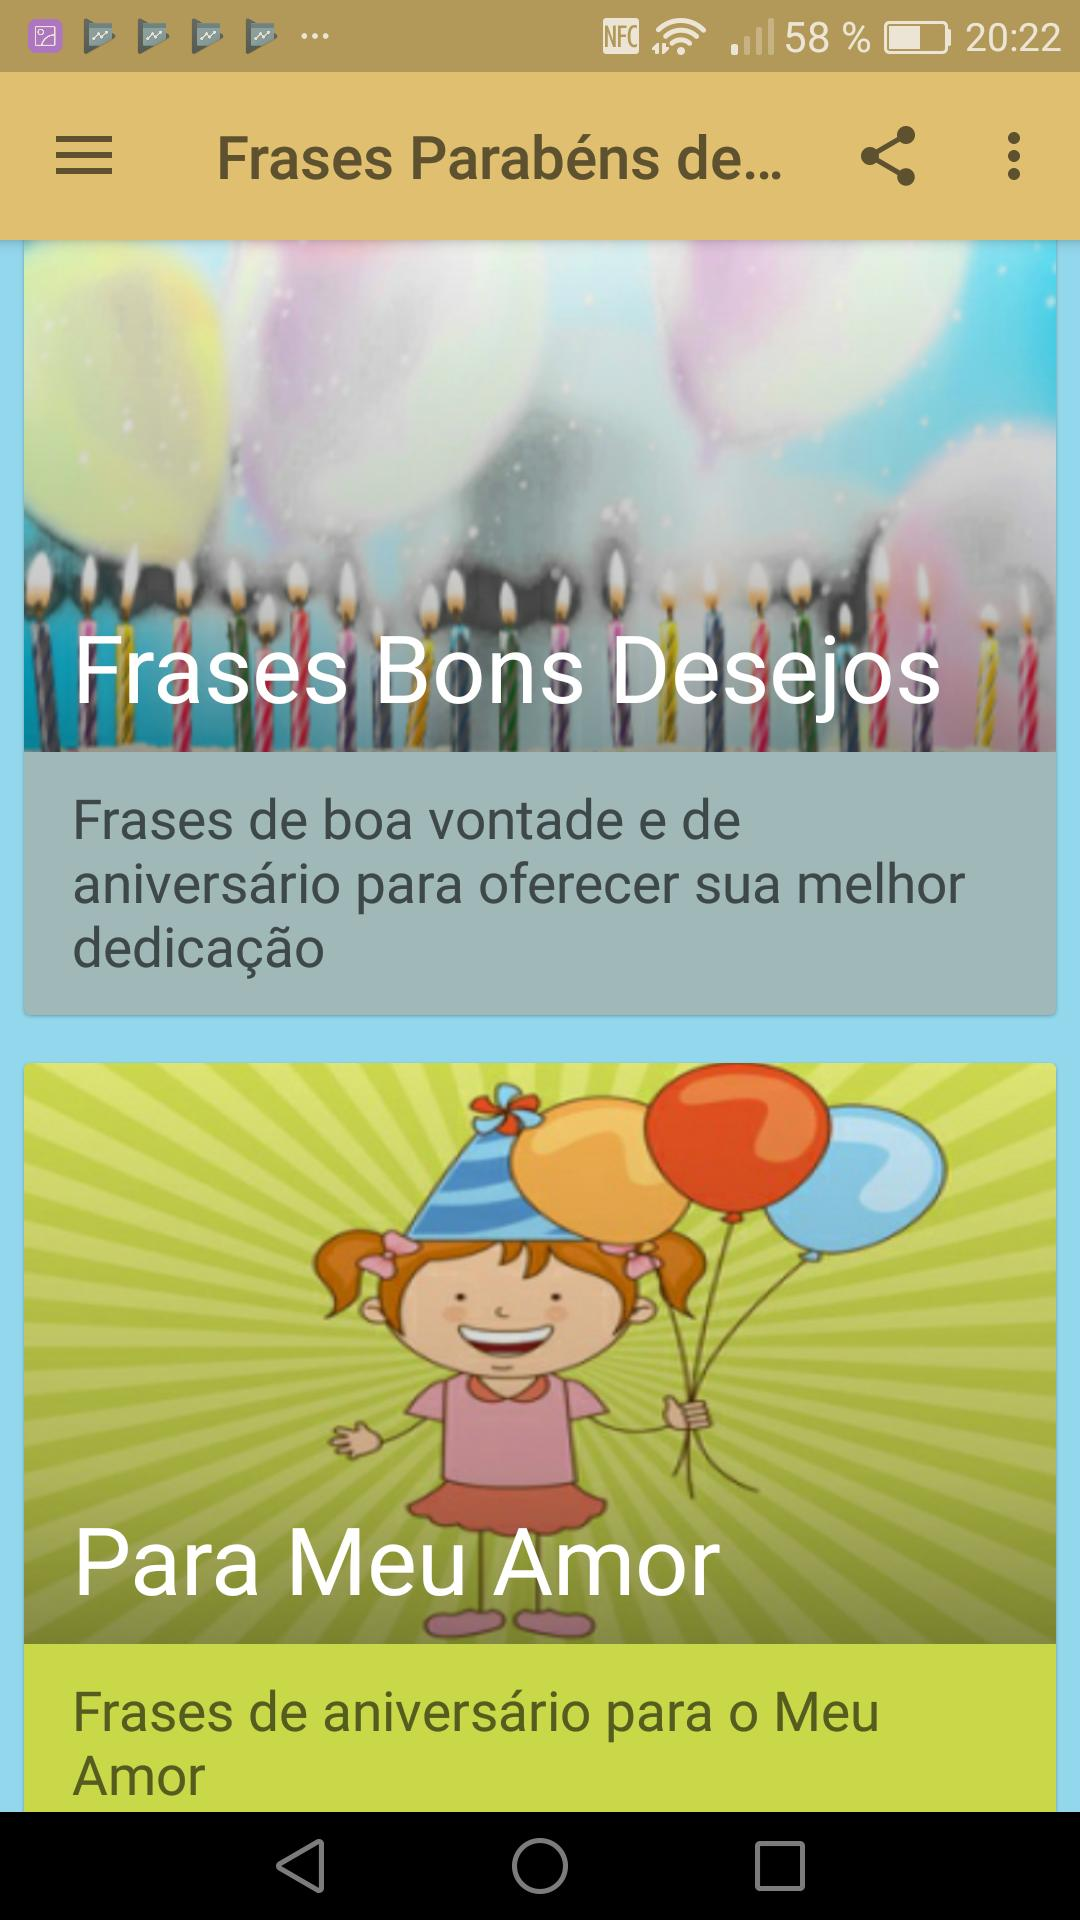 Frases De Parabéns De Aniversário For Android Apk Download